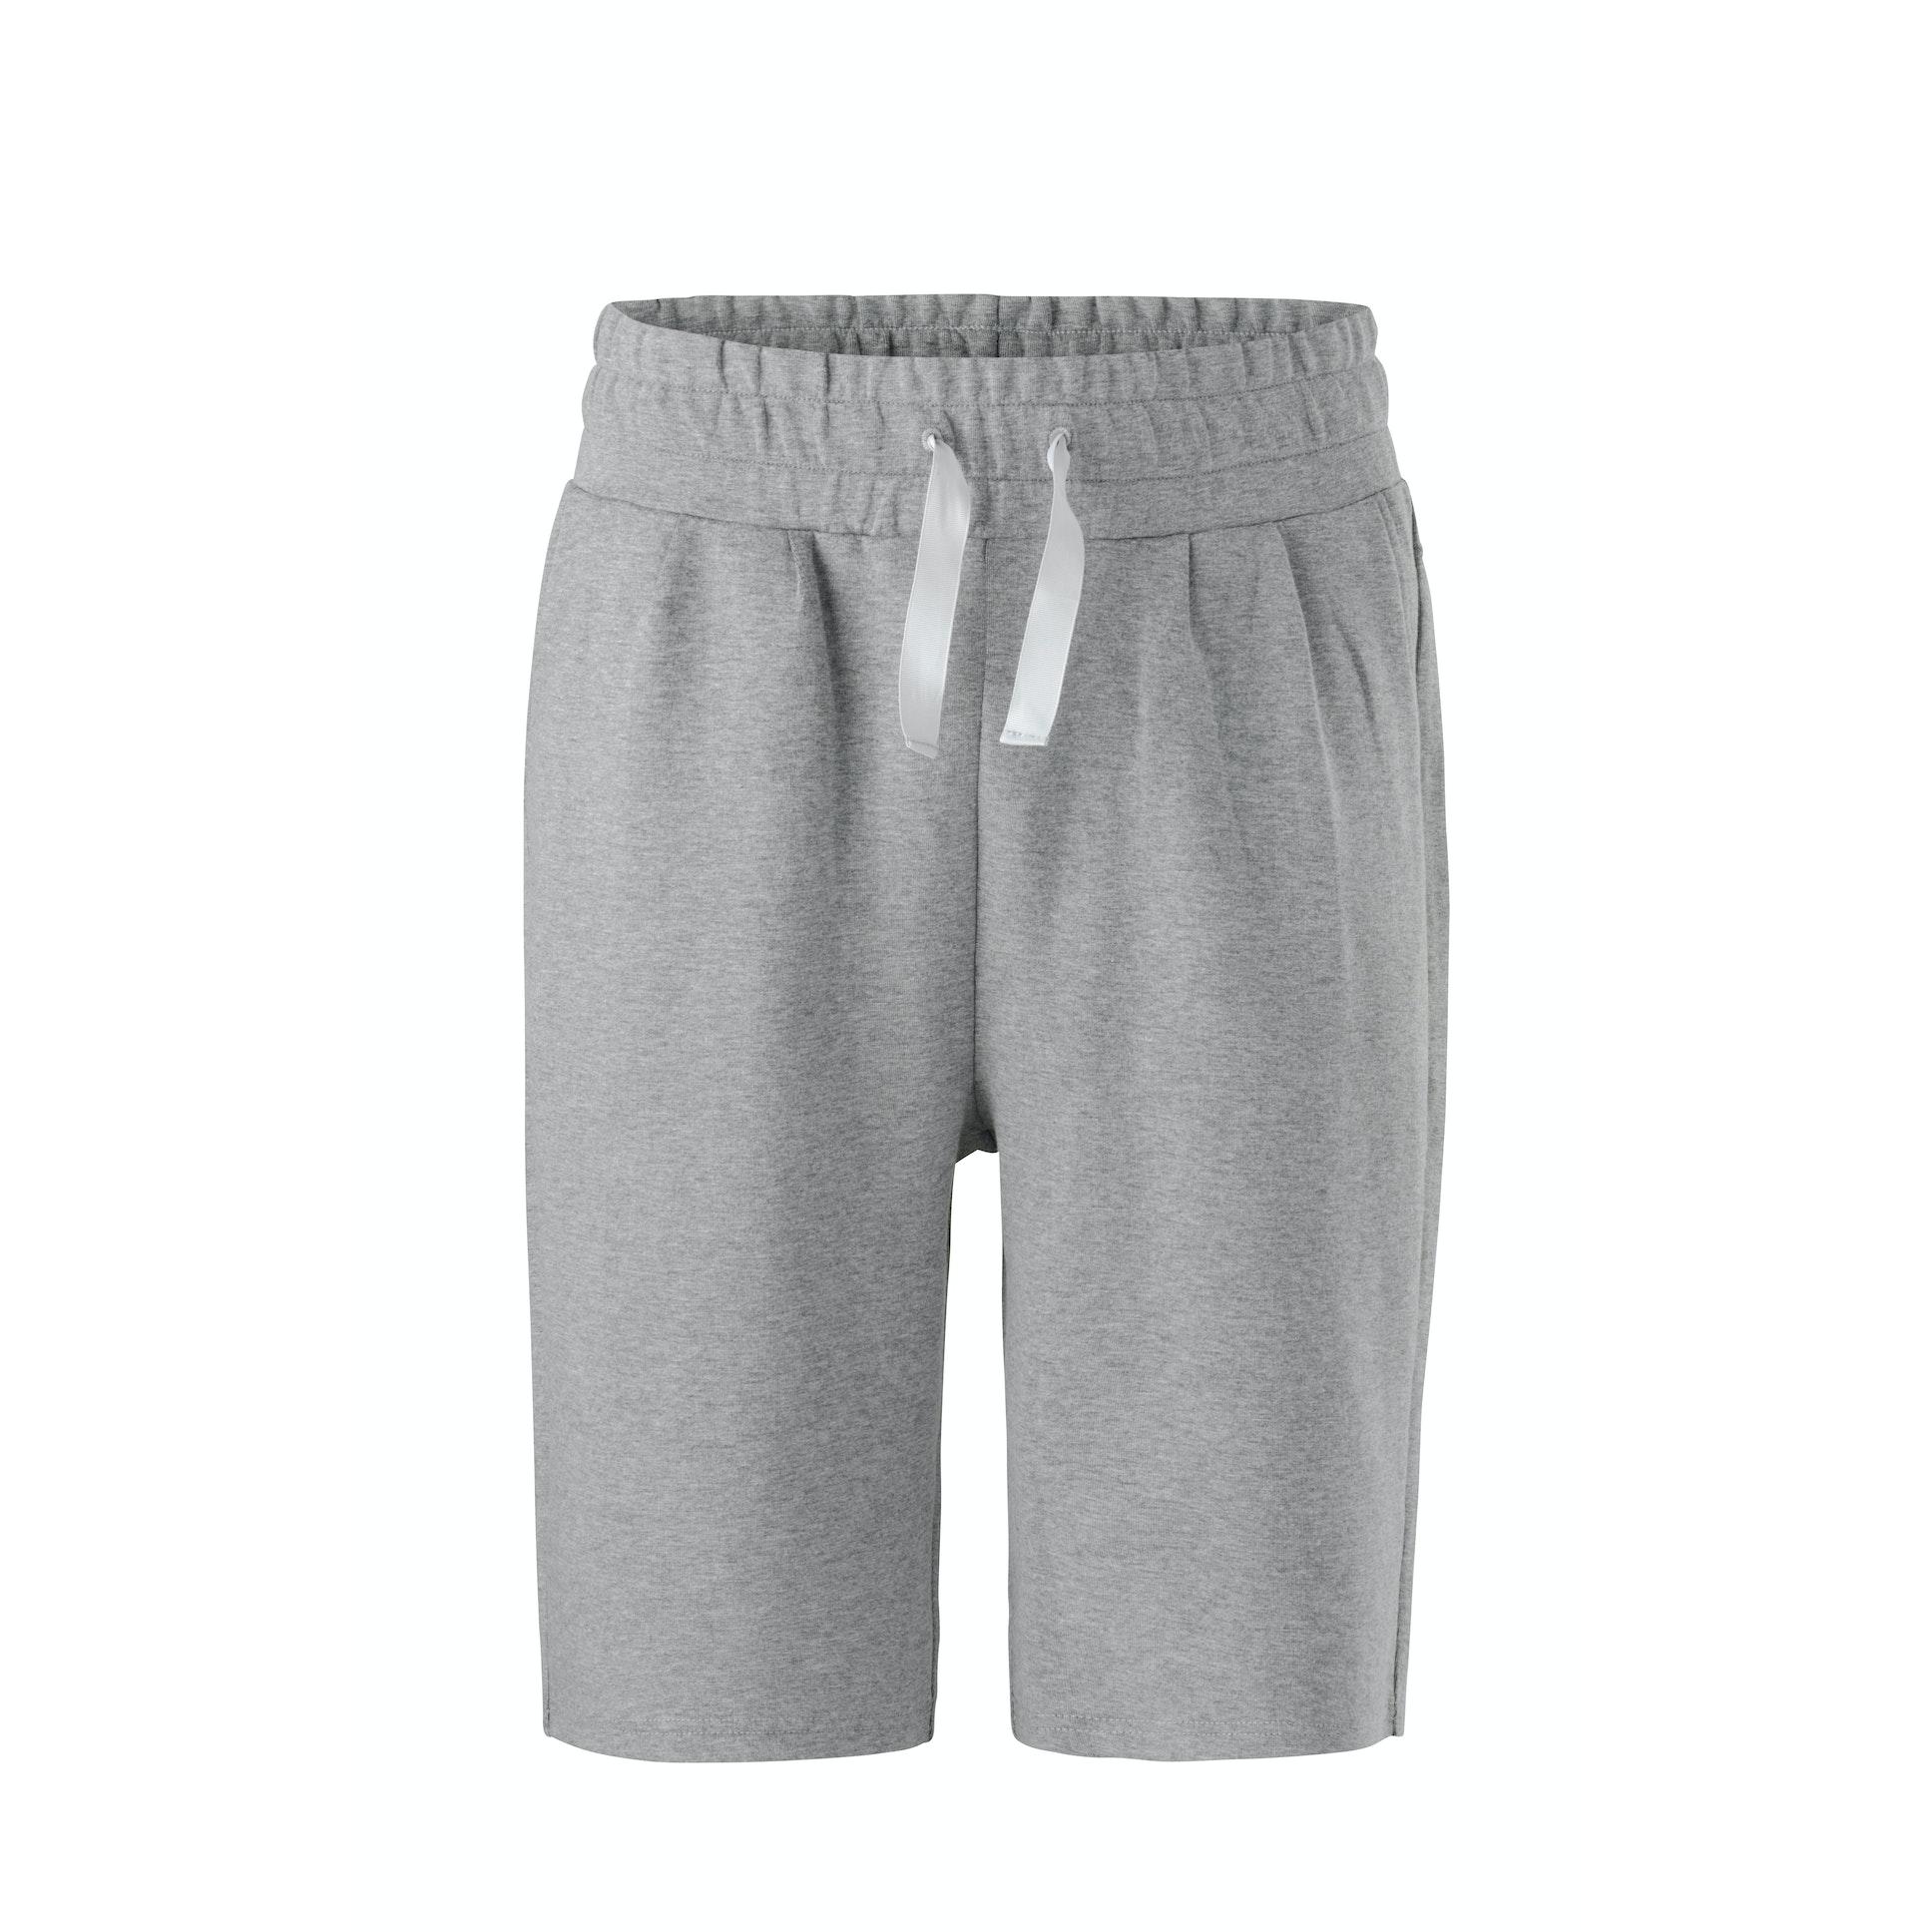 5f83d6deb7 element-shorts-grey-melange-9.jpg?w=1936&h=1936&fit=fill&bg=FFFFFF&q=75